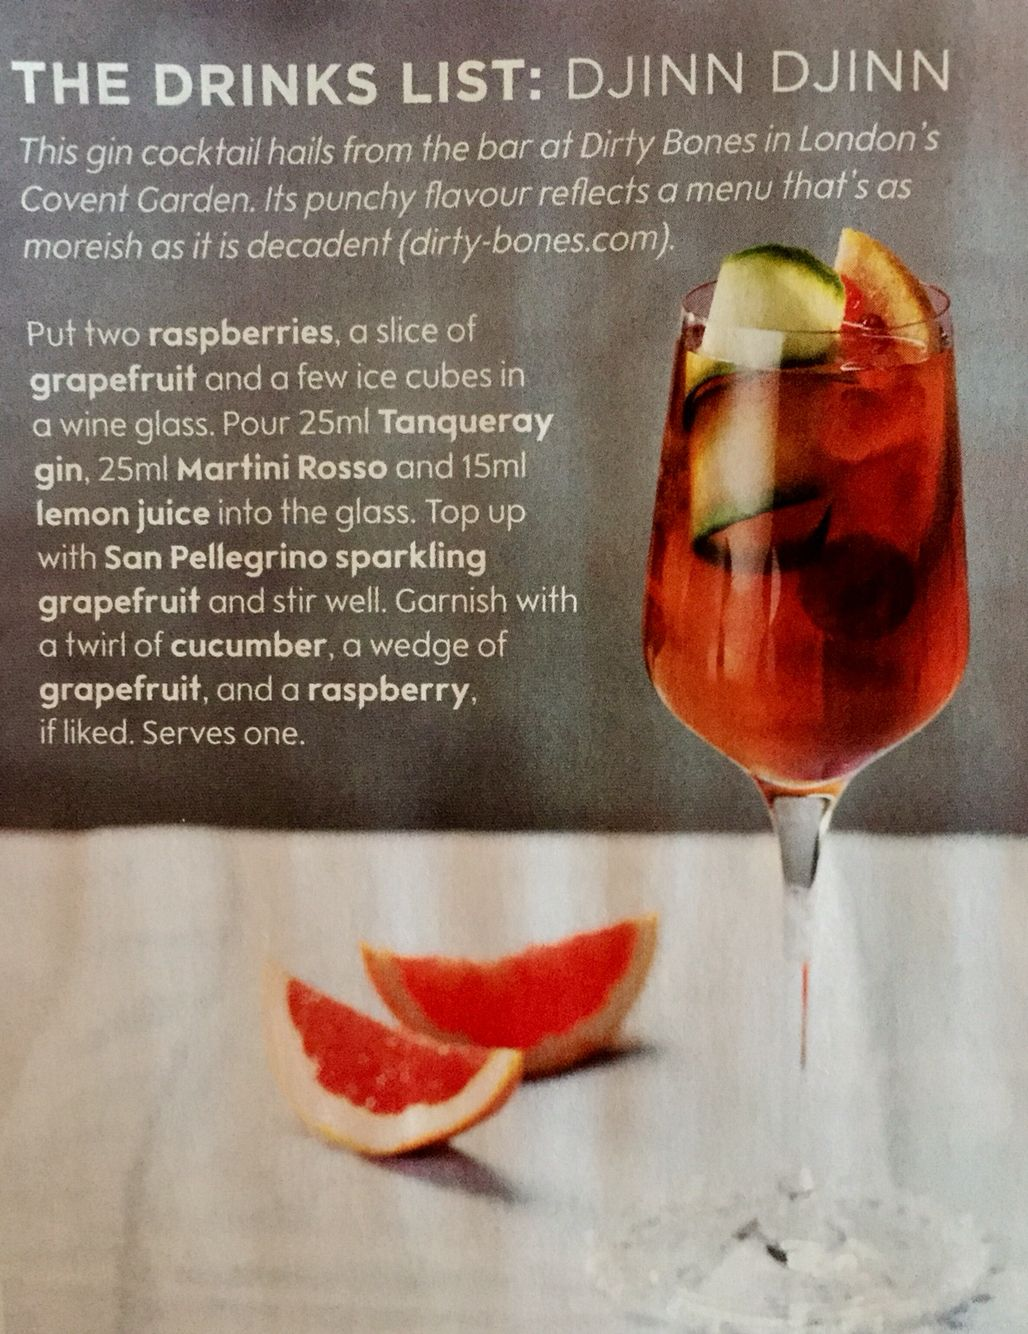 Djinn Djinn Cocktail Raspberries Sparkling Grapefruit Gin Martini Lemon Juice Cucumber Gin Cocktails Cocktails Cocktail Drinks